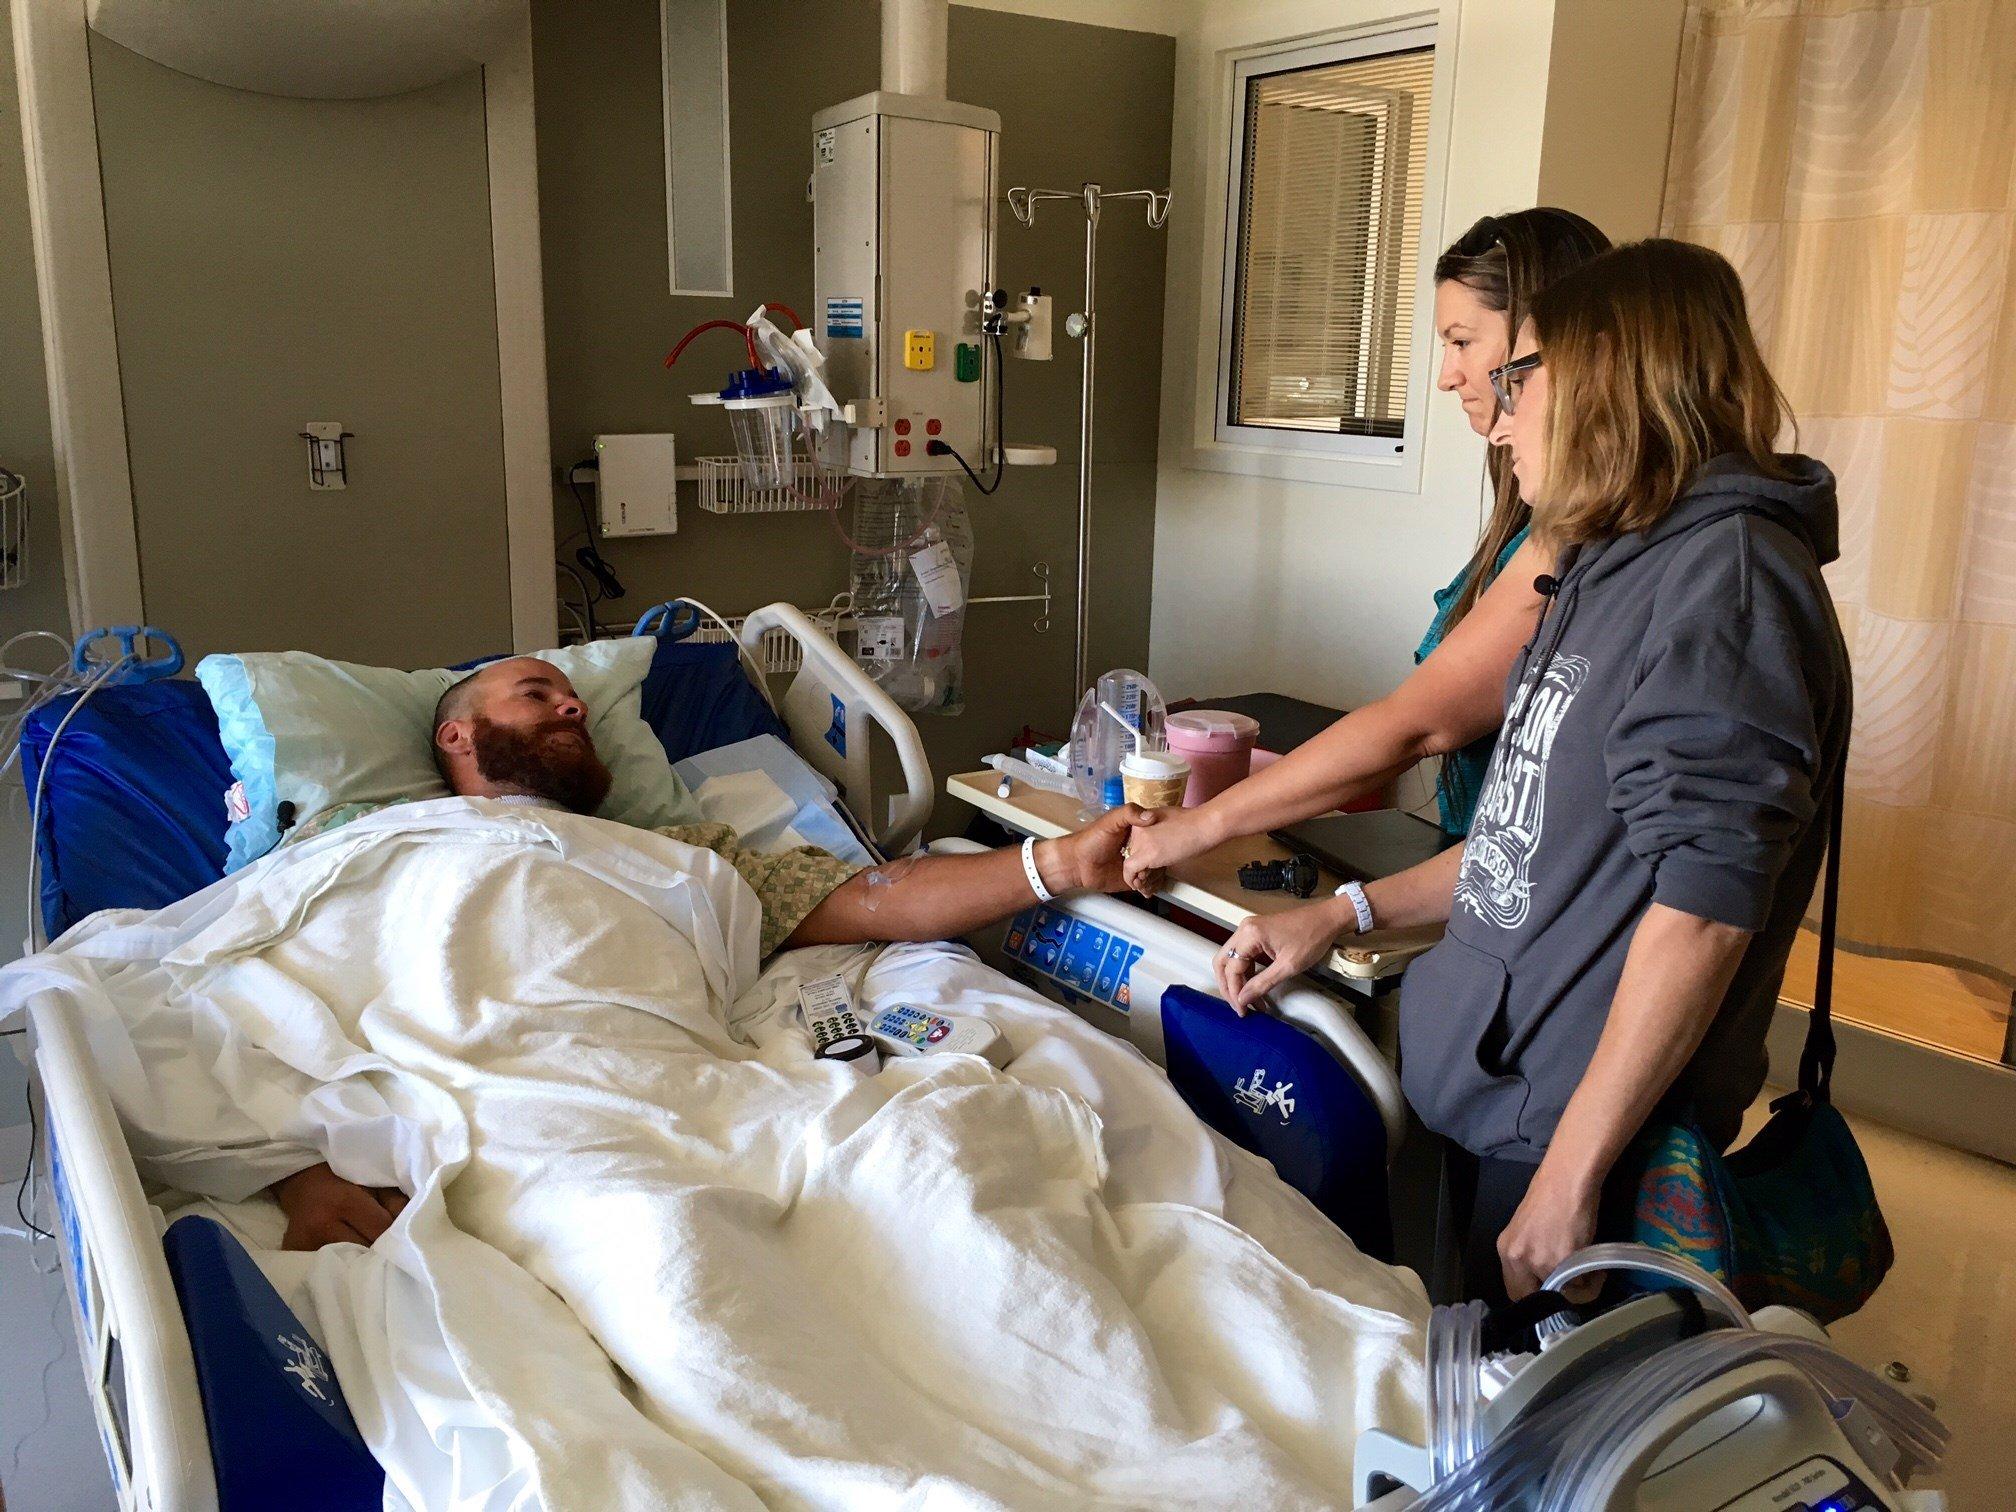 Scott Jensen, meeting his rescuers in his hospital room Wednesday. (Source: KPTV)